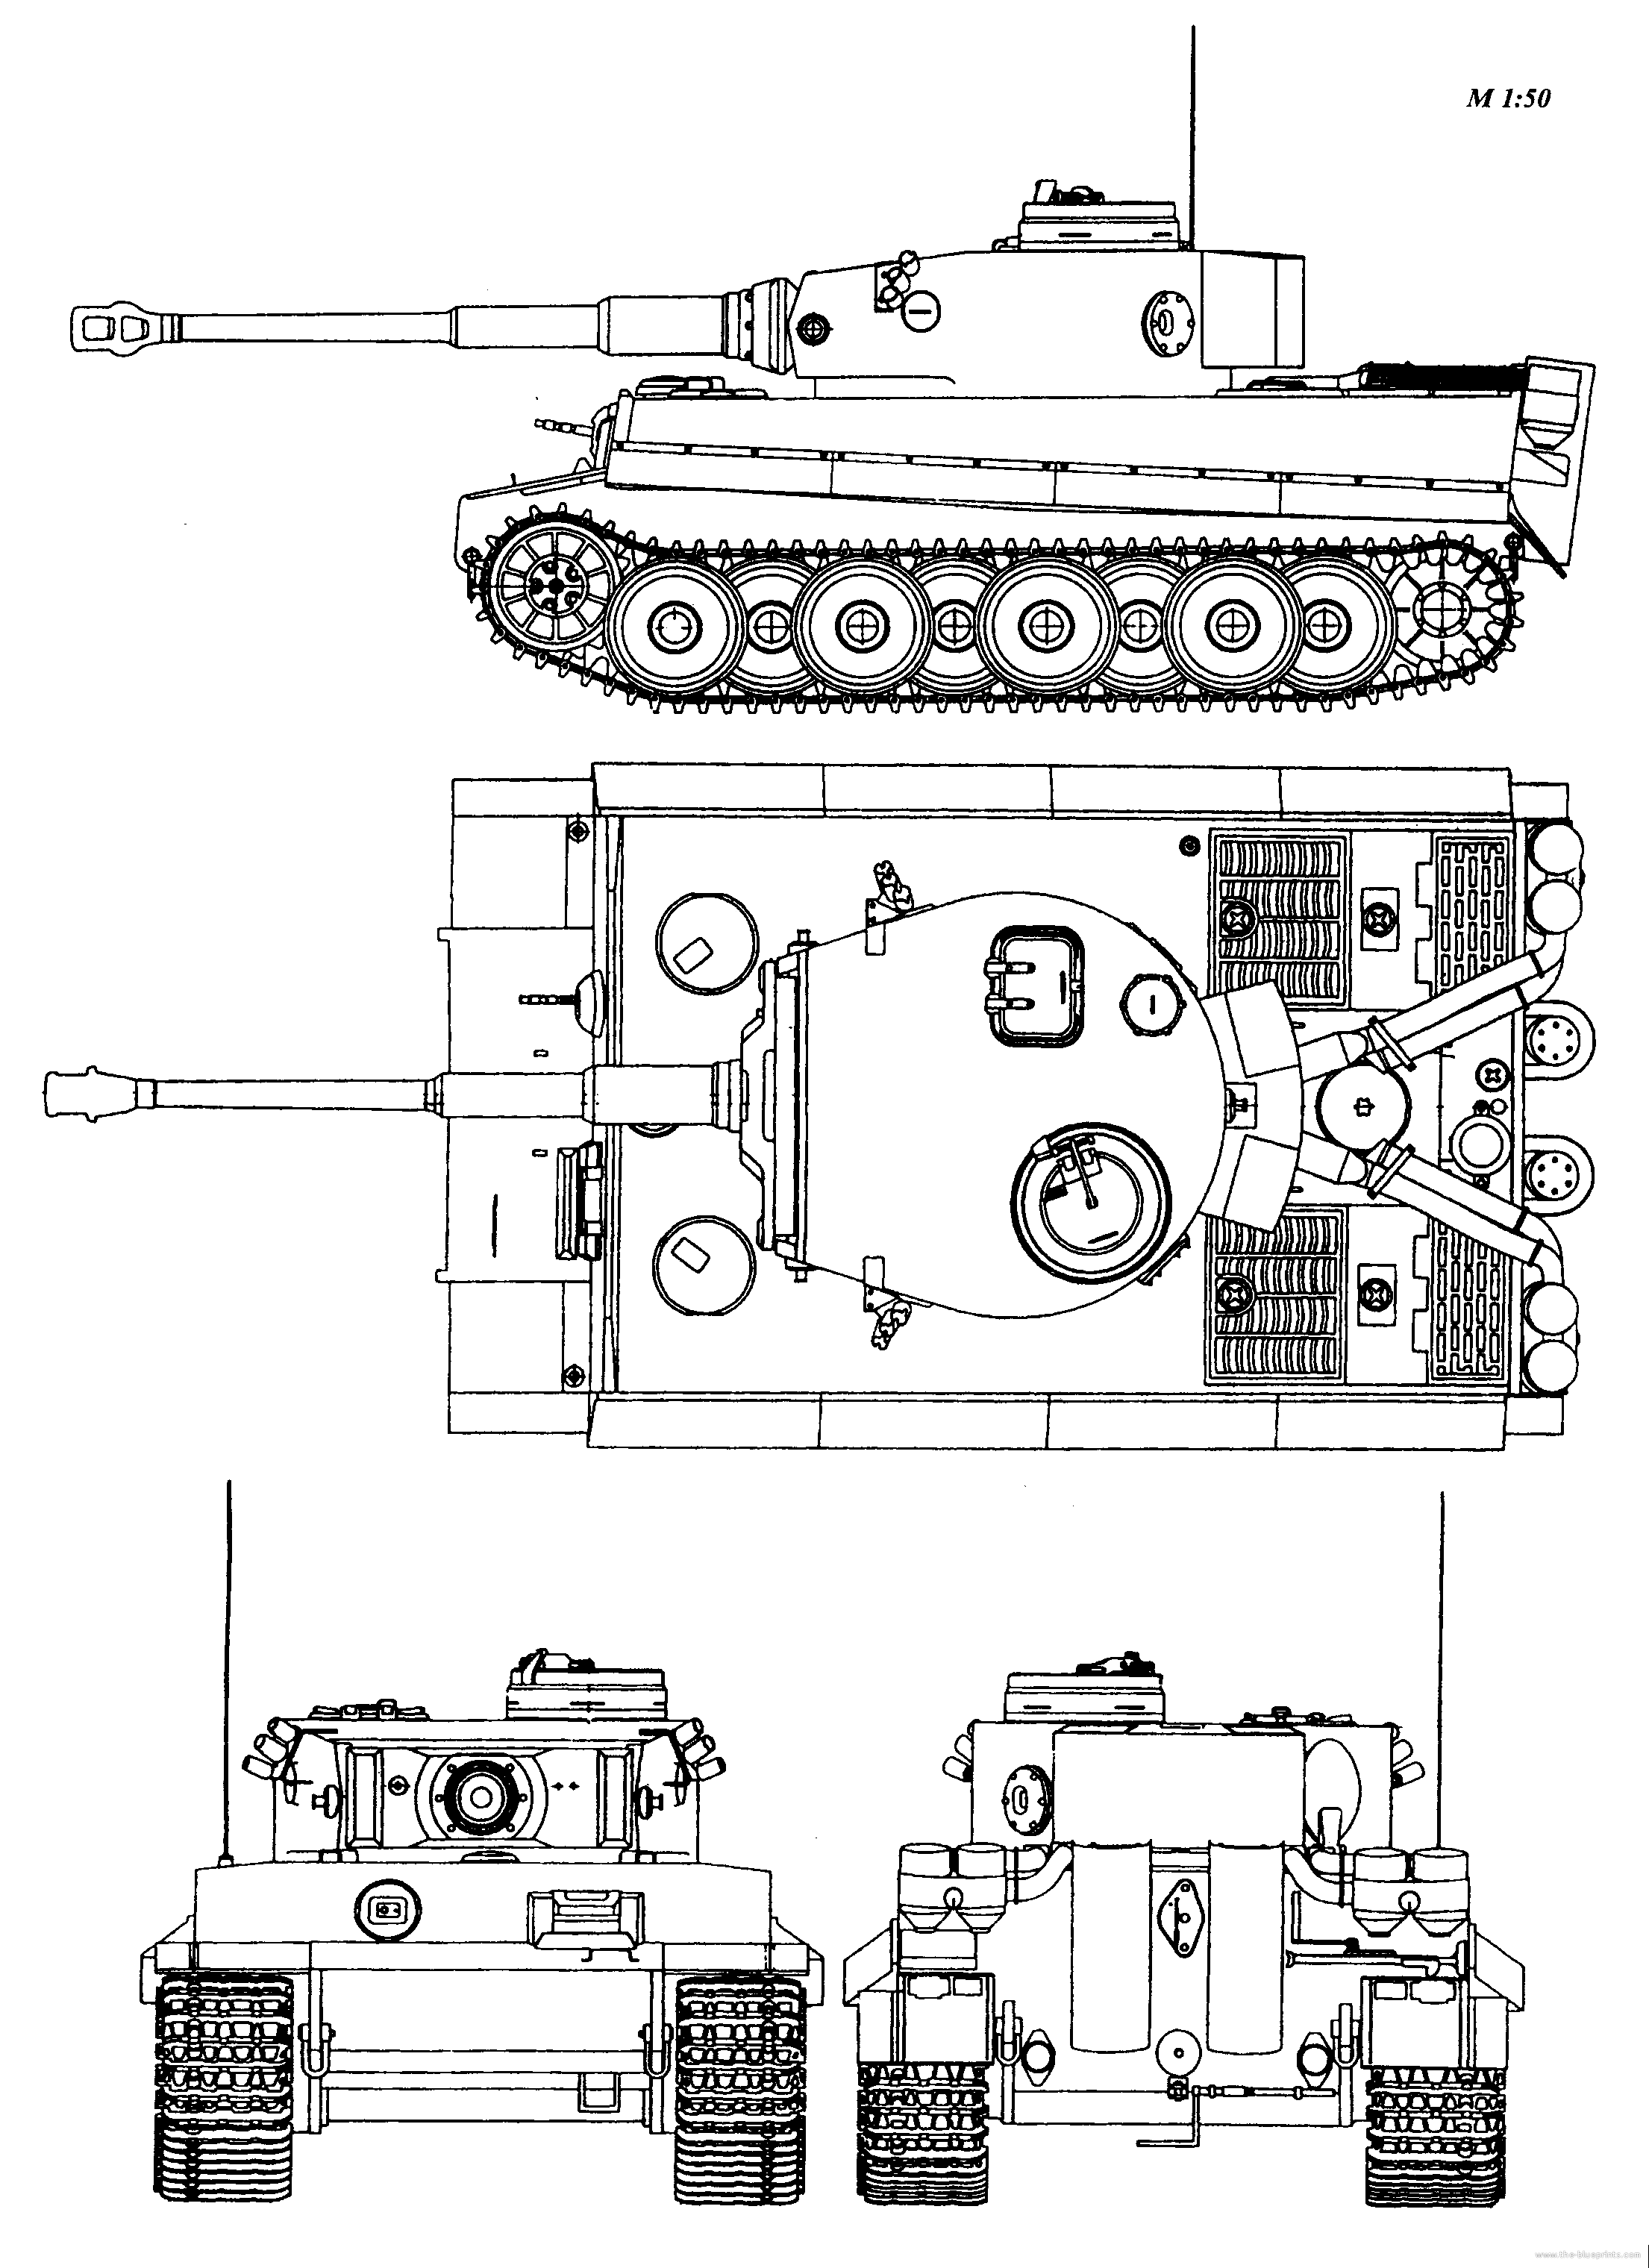 In Wwii German Tank Diagram Panzer Tanks Wire Diagrams Germany Wiring Tiger I 3d Model Videos Screenshots Fan Art War Thunder Clasic